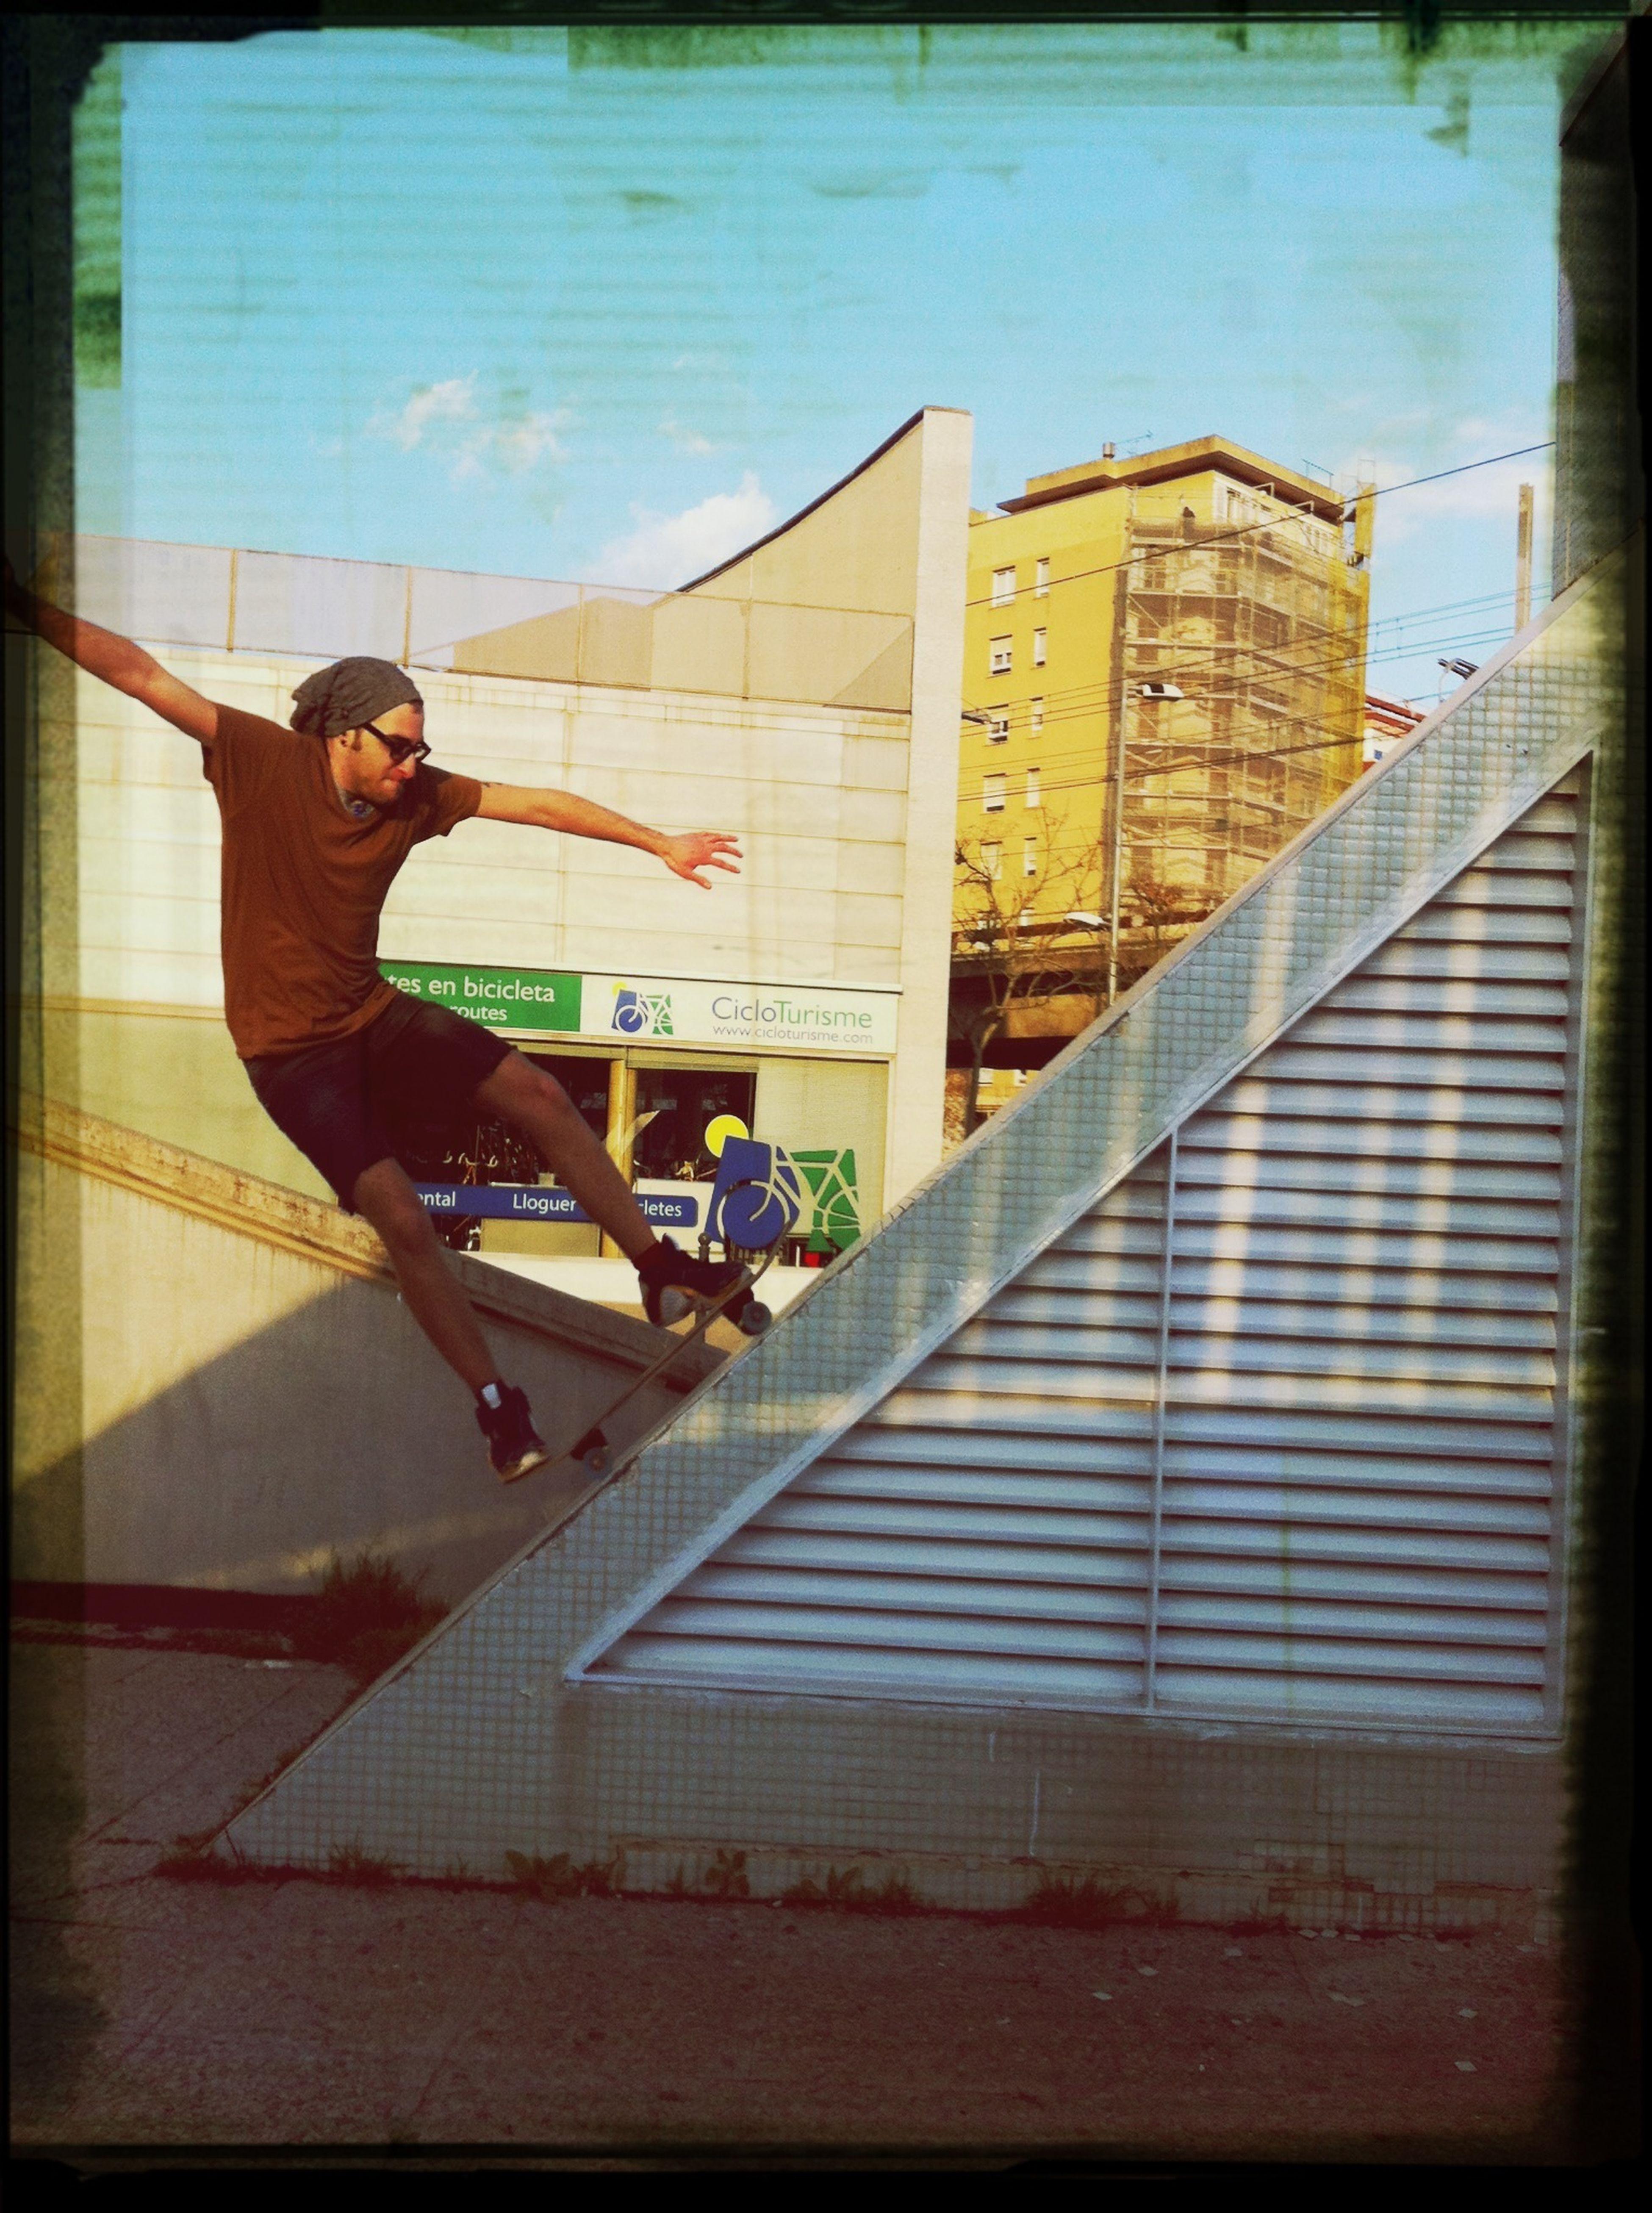 Goskateboarding